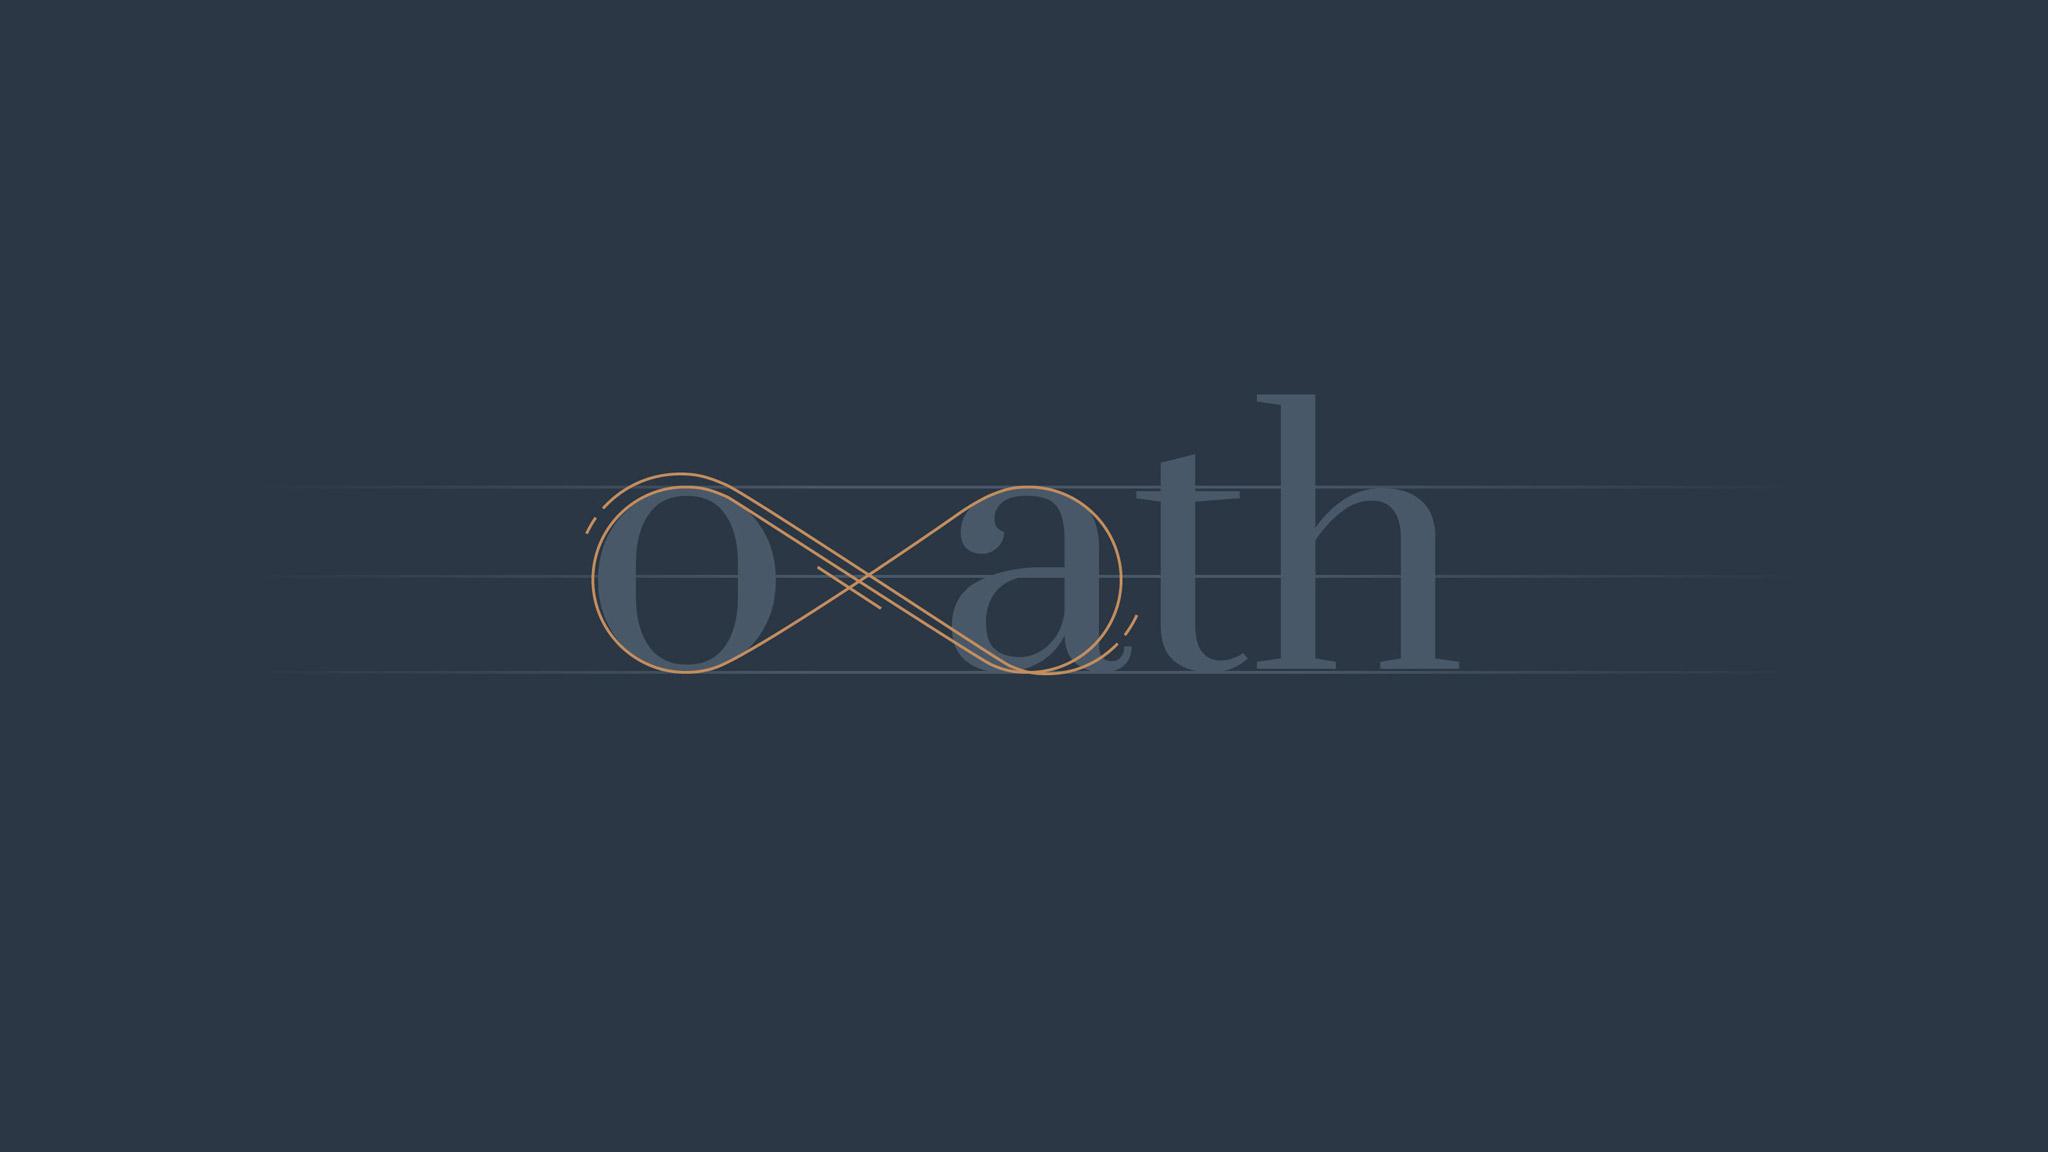 Elements of Oath Insurance cannabis logo design